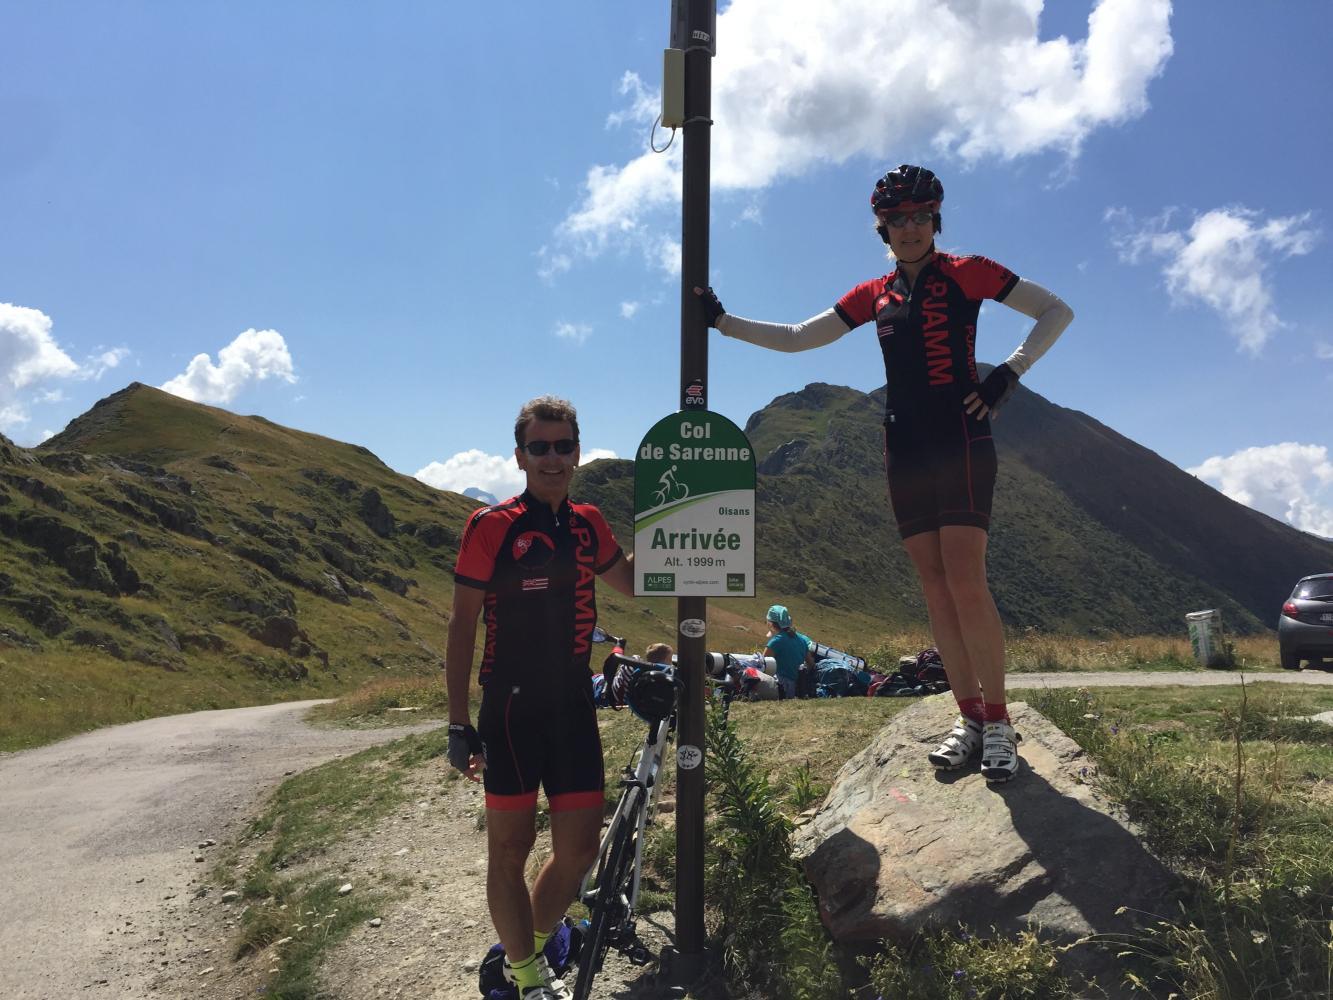 Col de Sarenne (Mizoën) Bike Climb - PJAMM Cycling